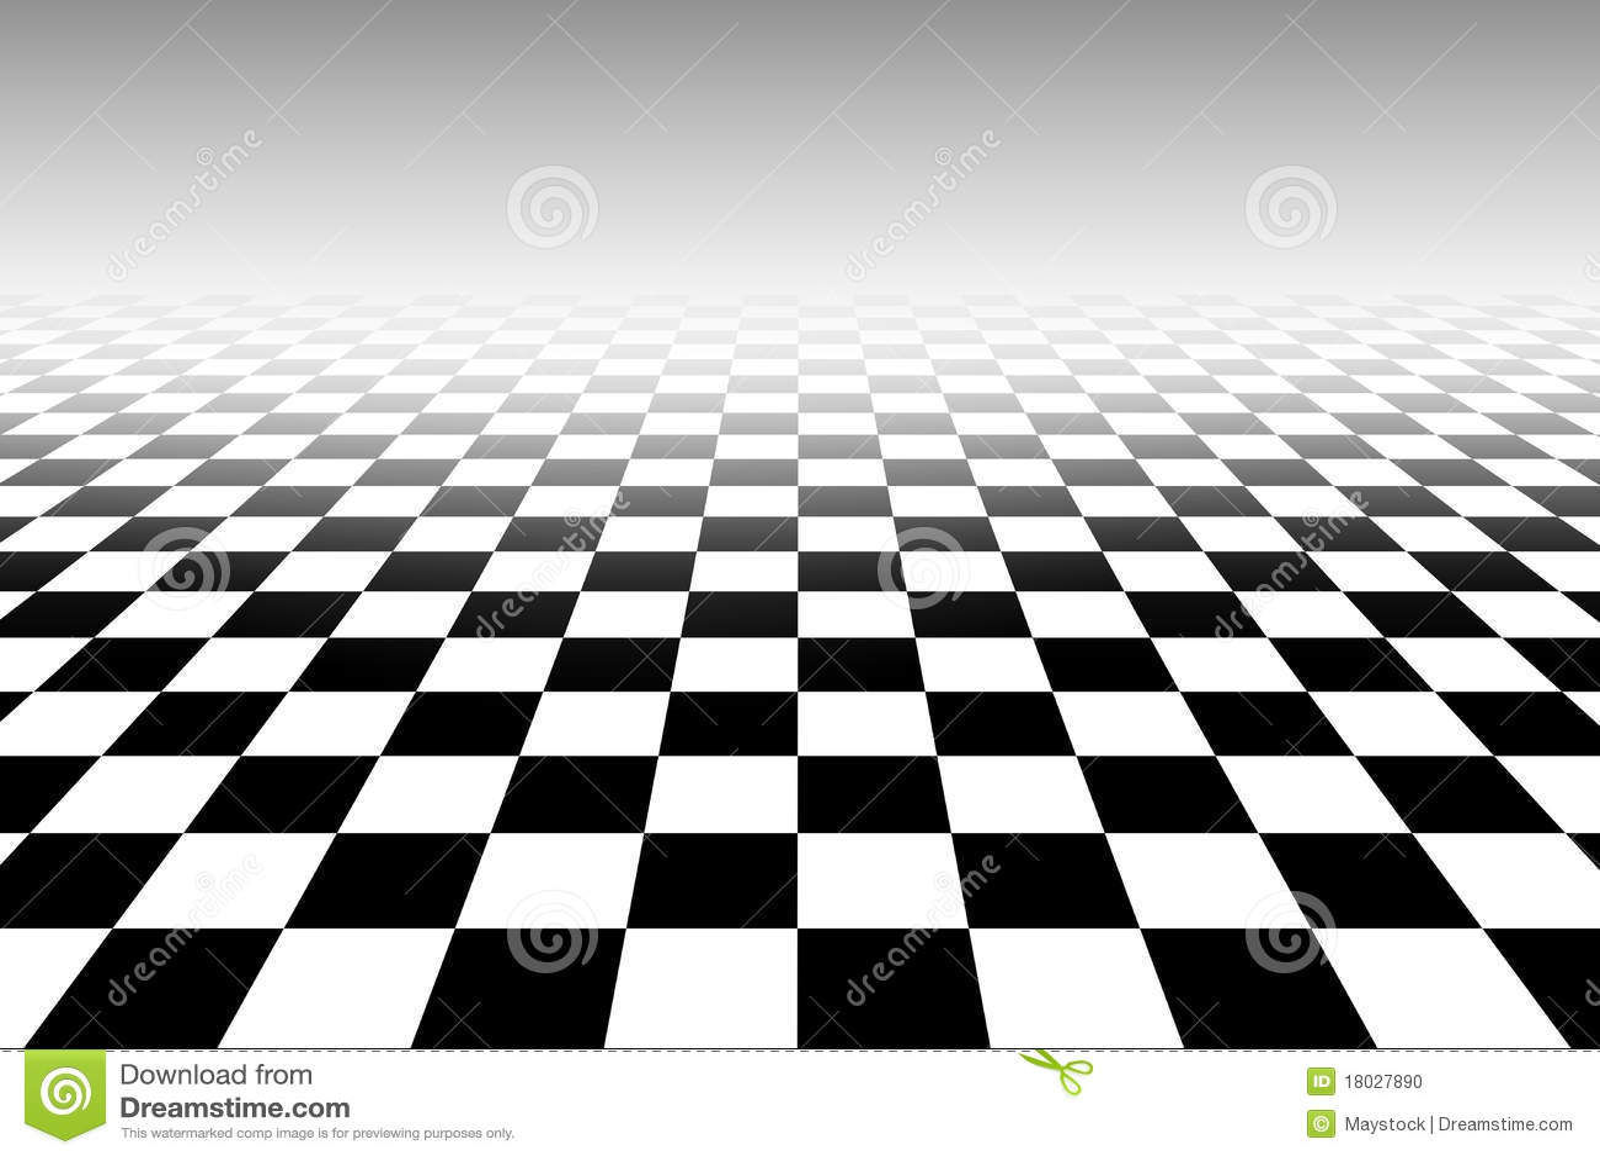 Teste Padrao Preto E Branco Do Tabuleiro De Xadrez De